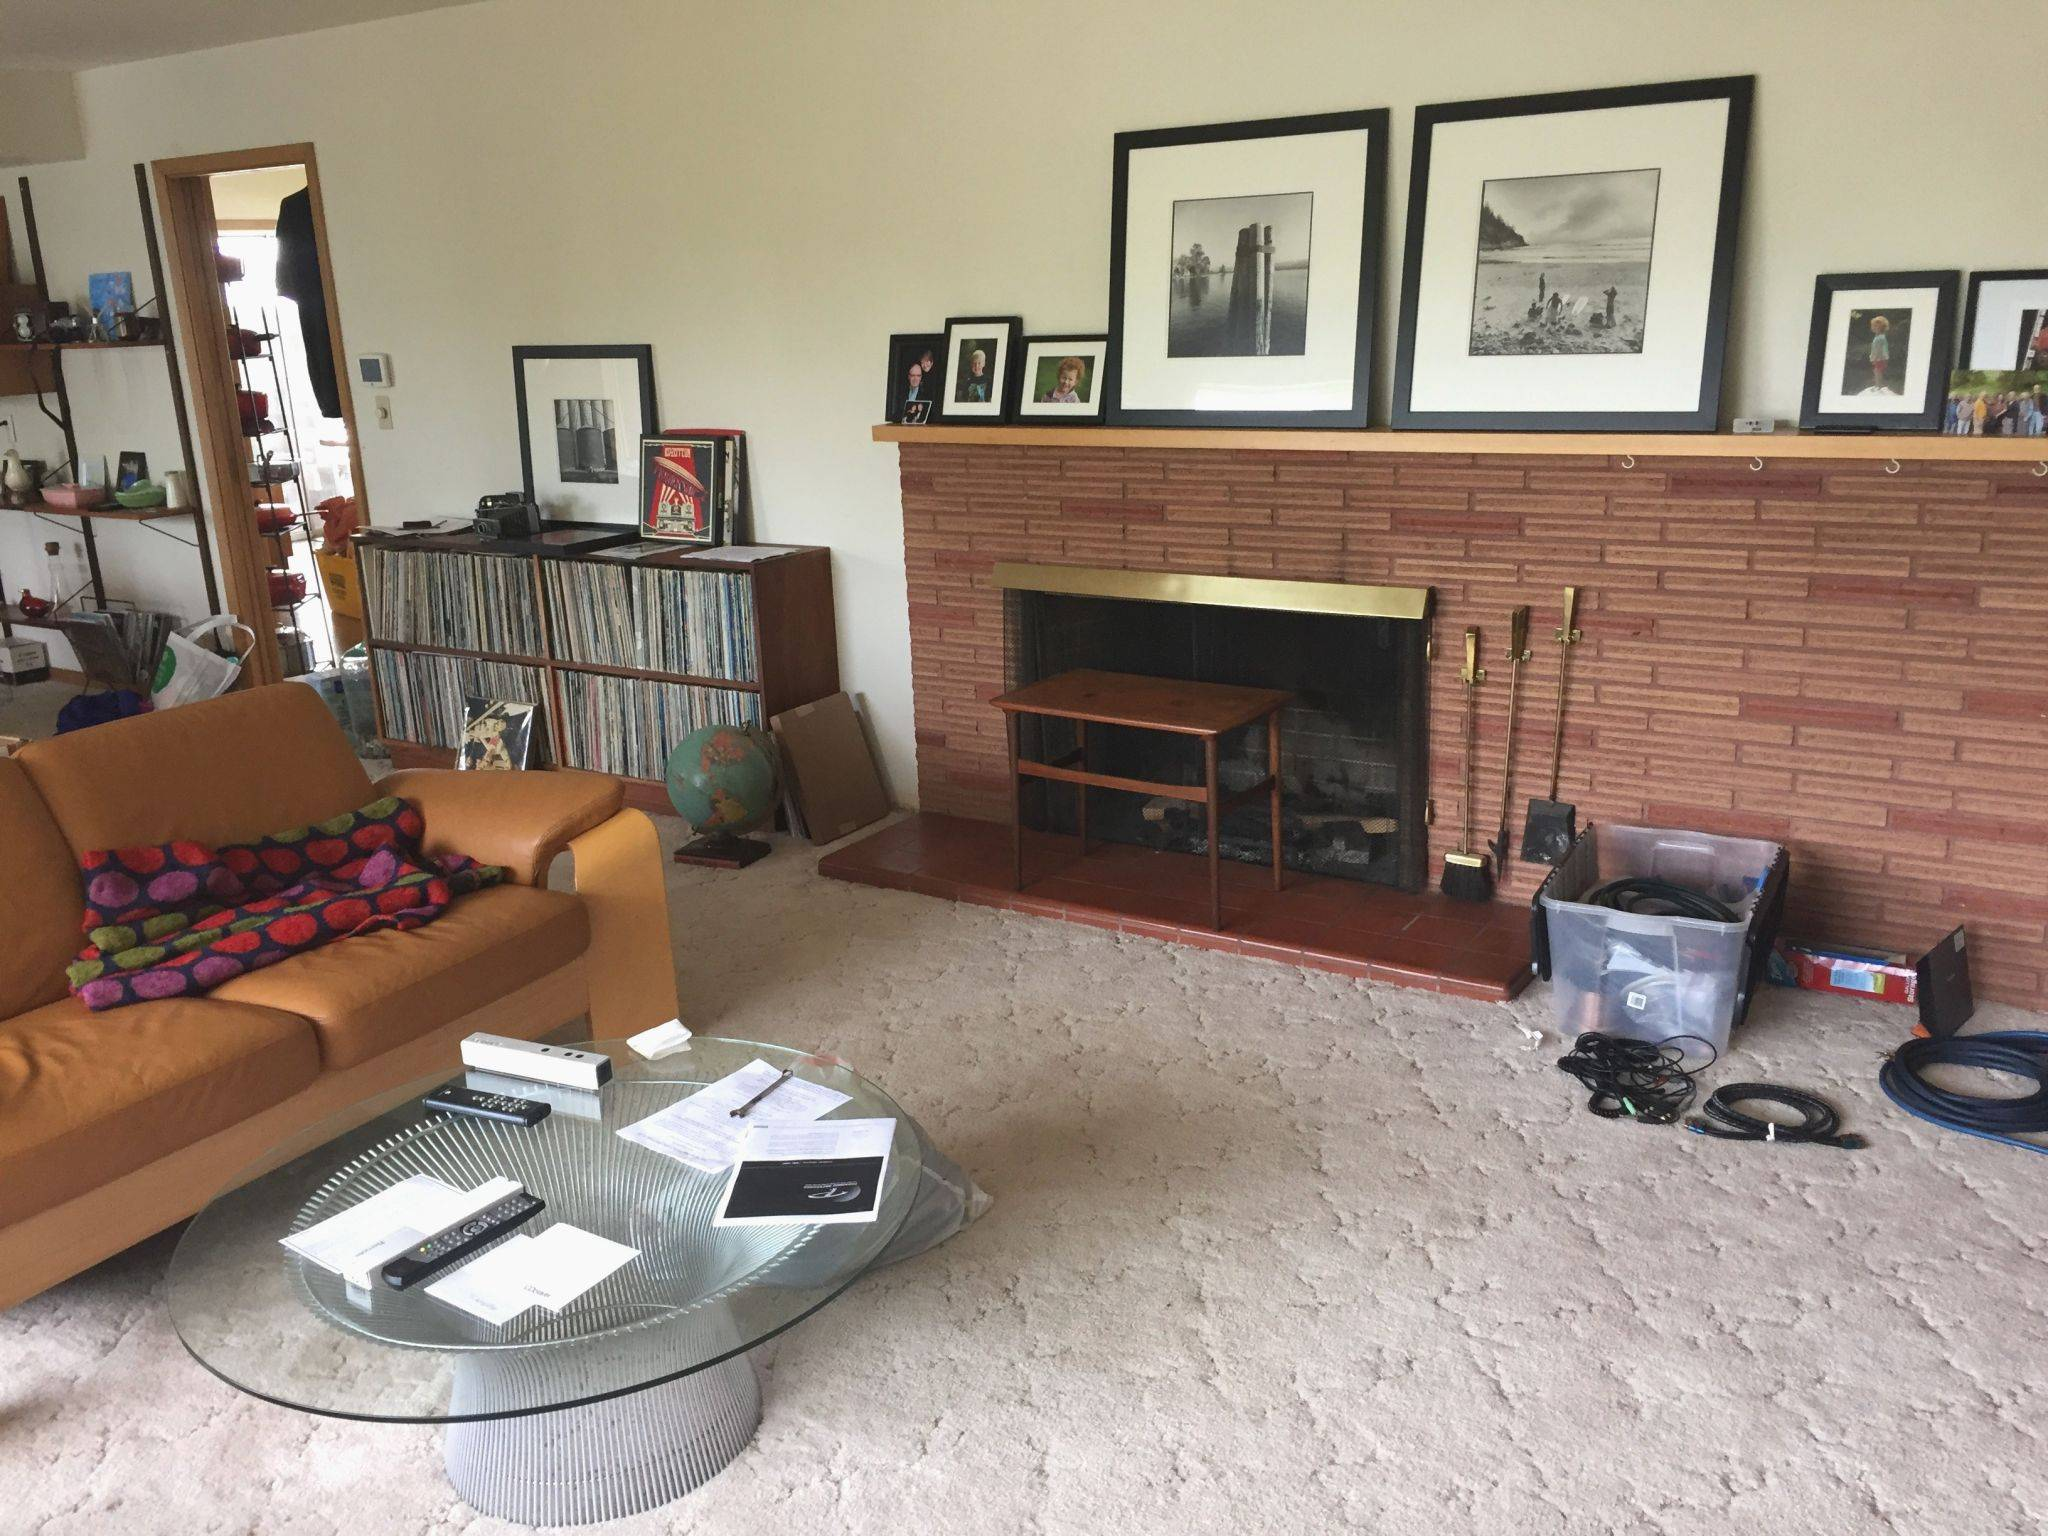 modern house interior paint ideas modern living room paint color ideas of modern house interior paint ideas